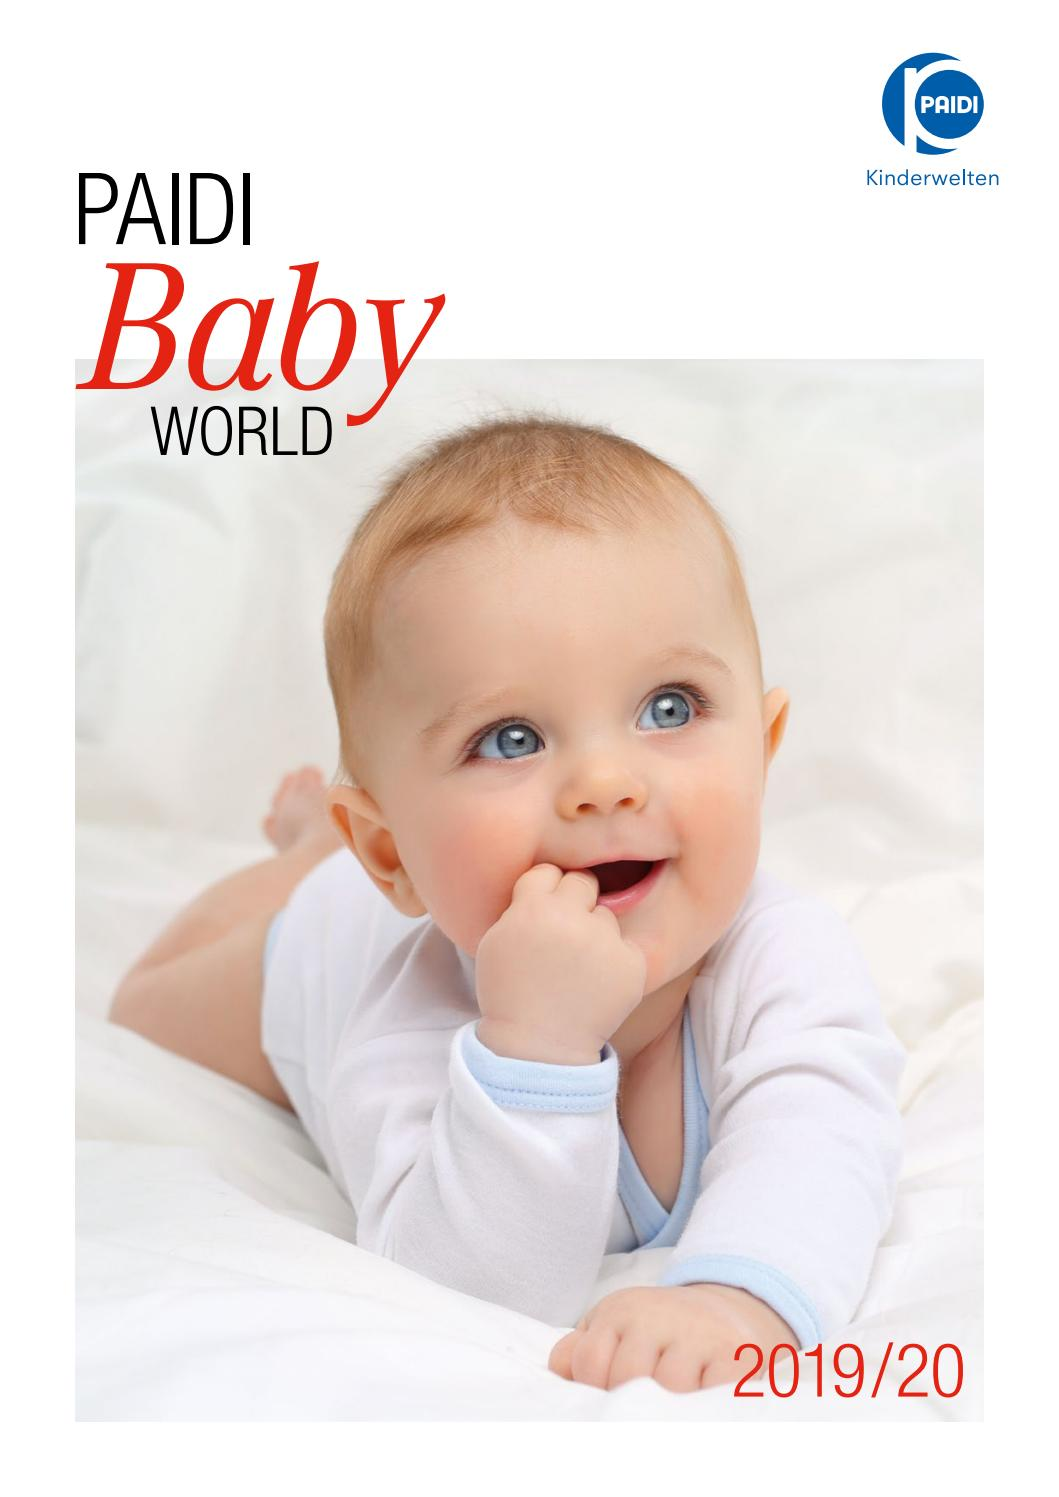 Full Size of Paidi Lattenrost 120x200 Fiona Comfort Baby World 2019 2020 By Ip Luxembourg Bett 160x200 Mit 140x200 Matratze Und 90x200 Betten 180x200 Komplett Weiß Wohnzimmer Paidi Lattenrost 120x200